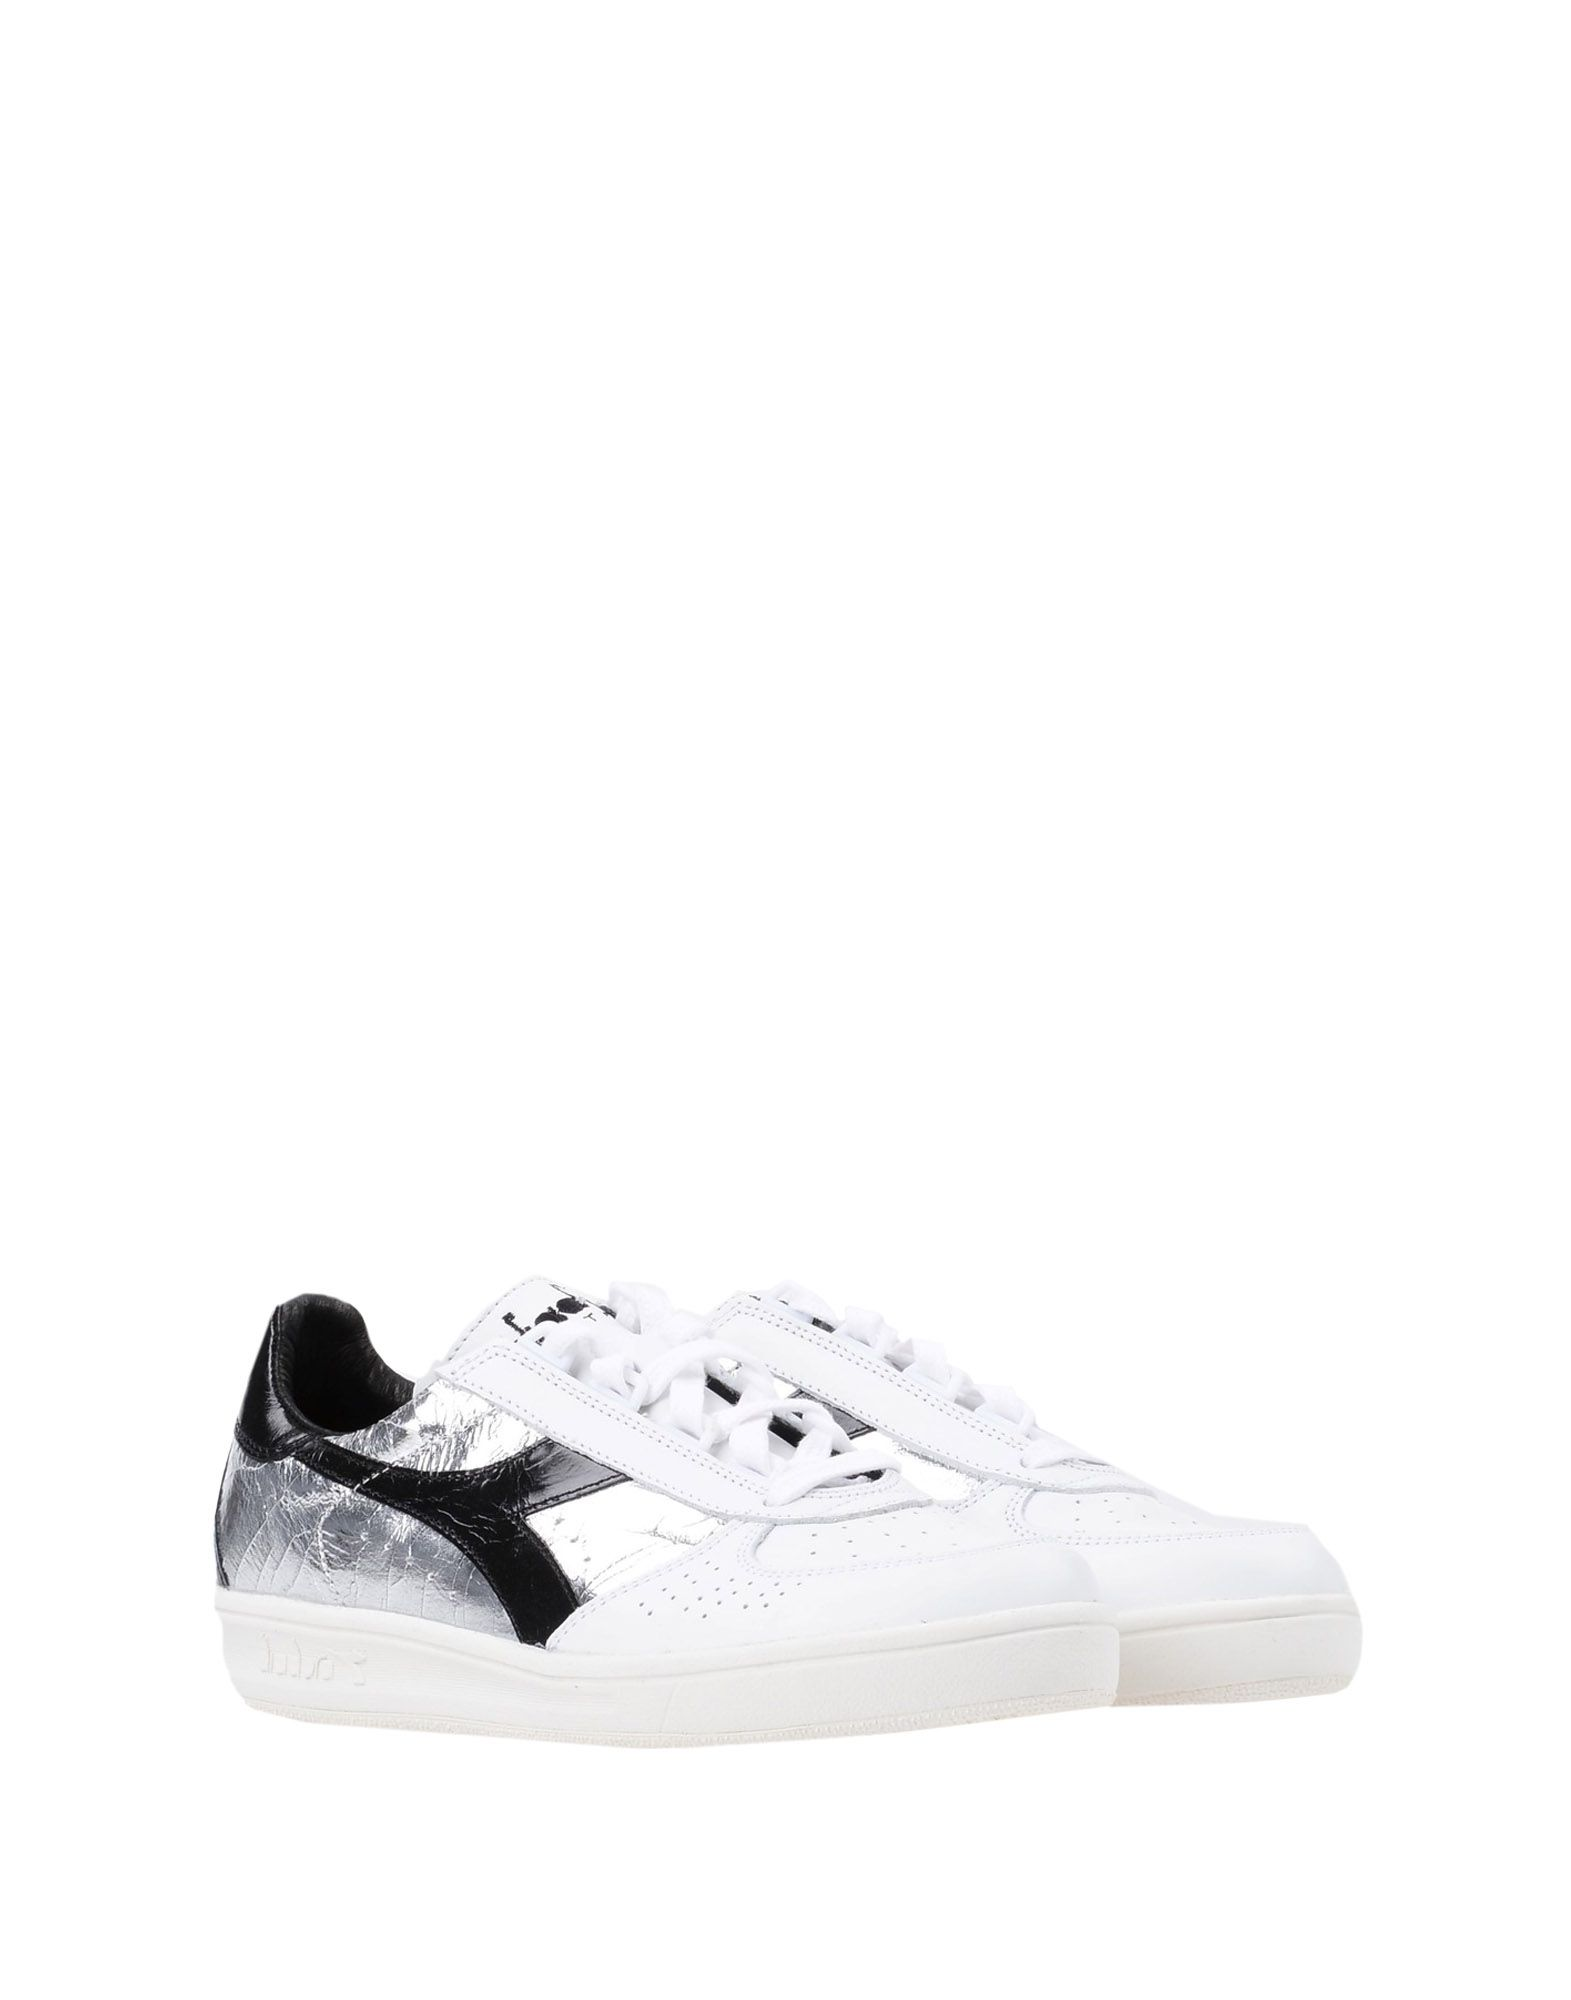 Diadora Heritage B.Elite Silver - - - Sneakers - Women Diadora Heritage Sneakers online on  Canada - 11328411TH 0522a5